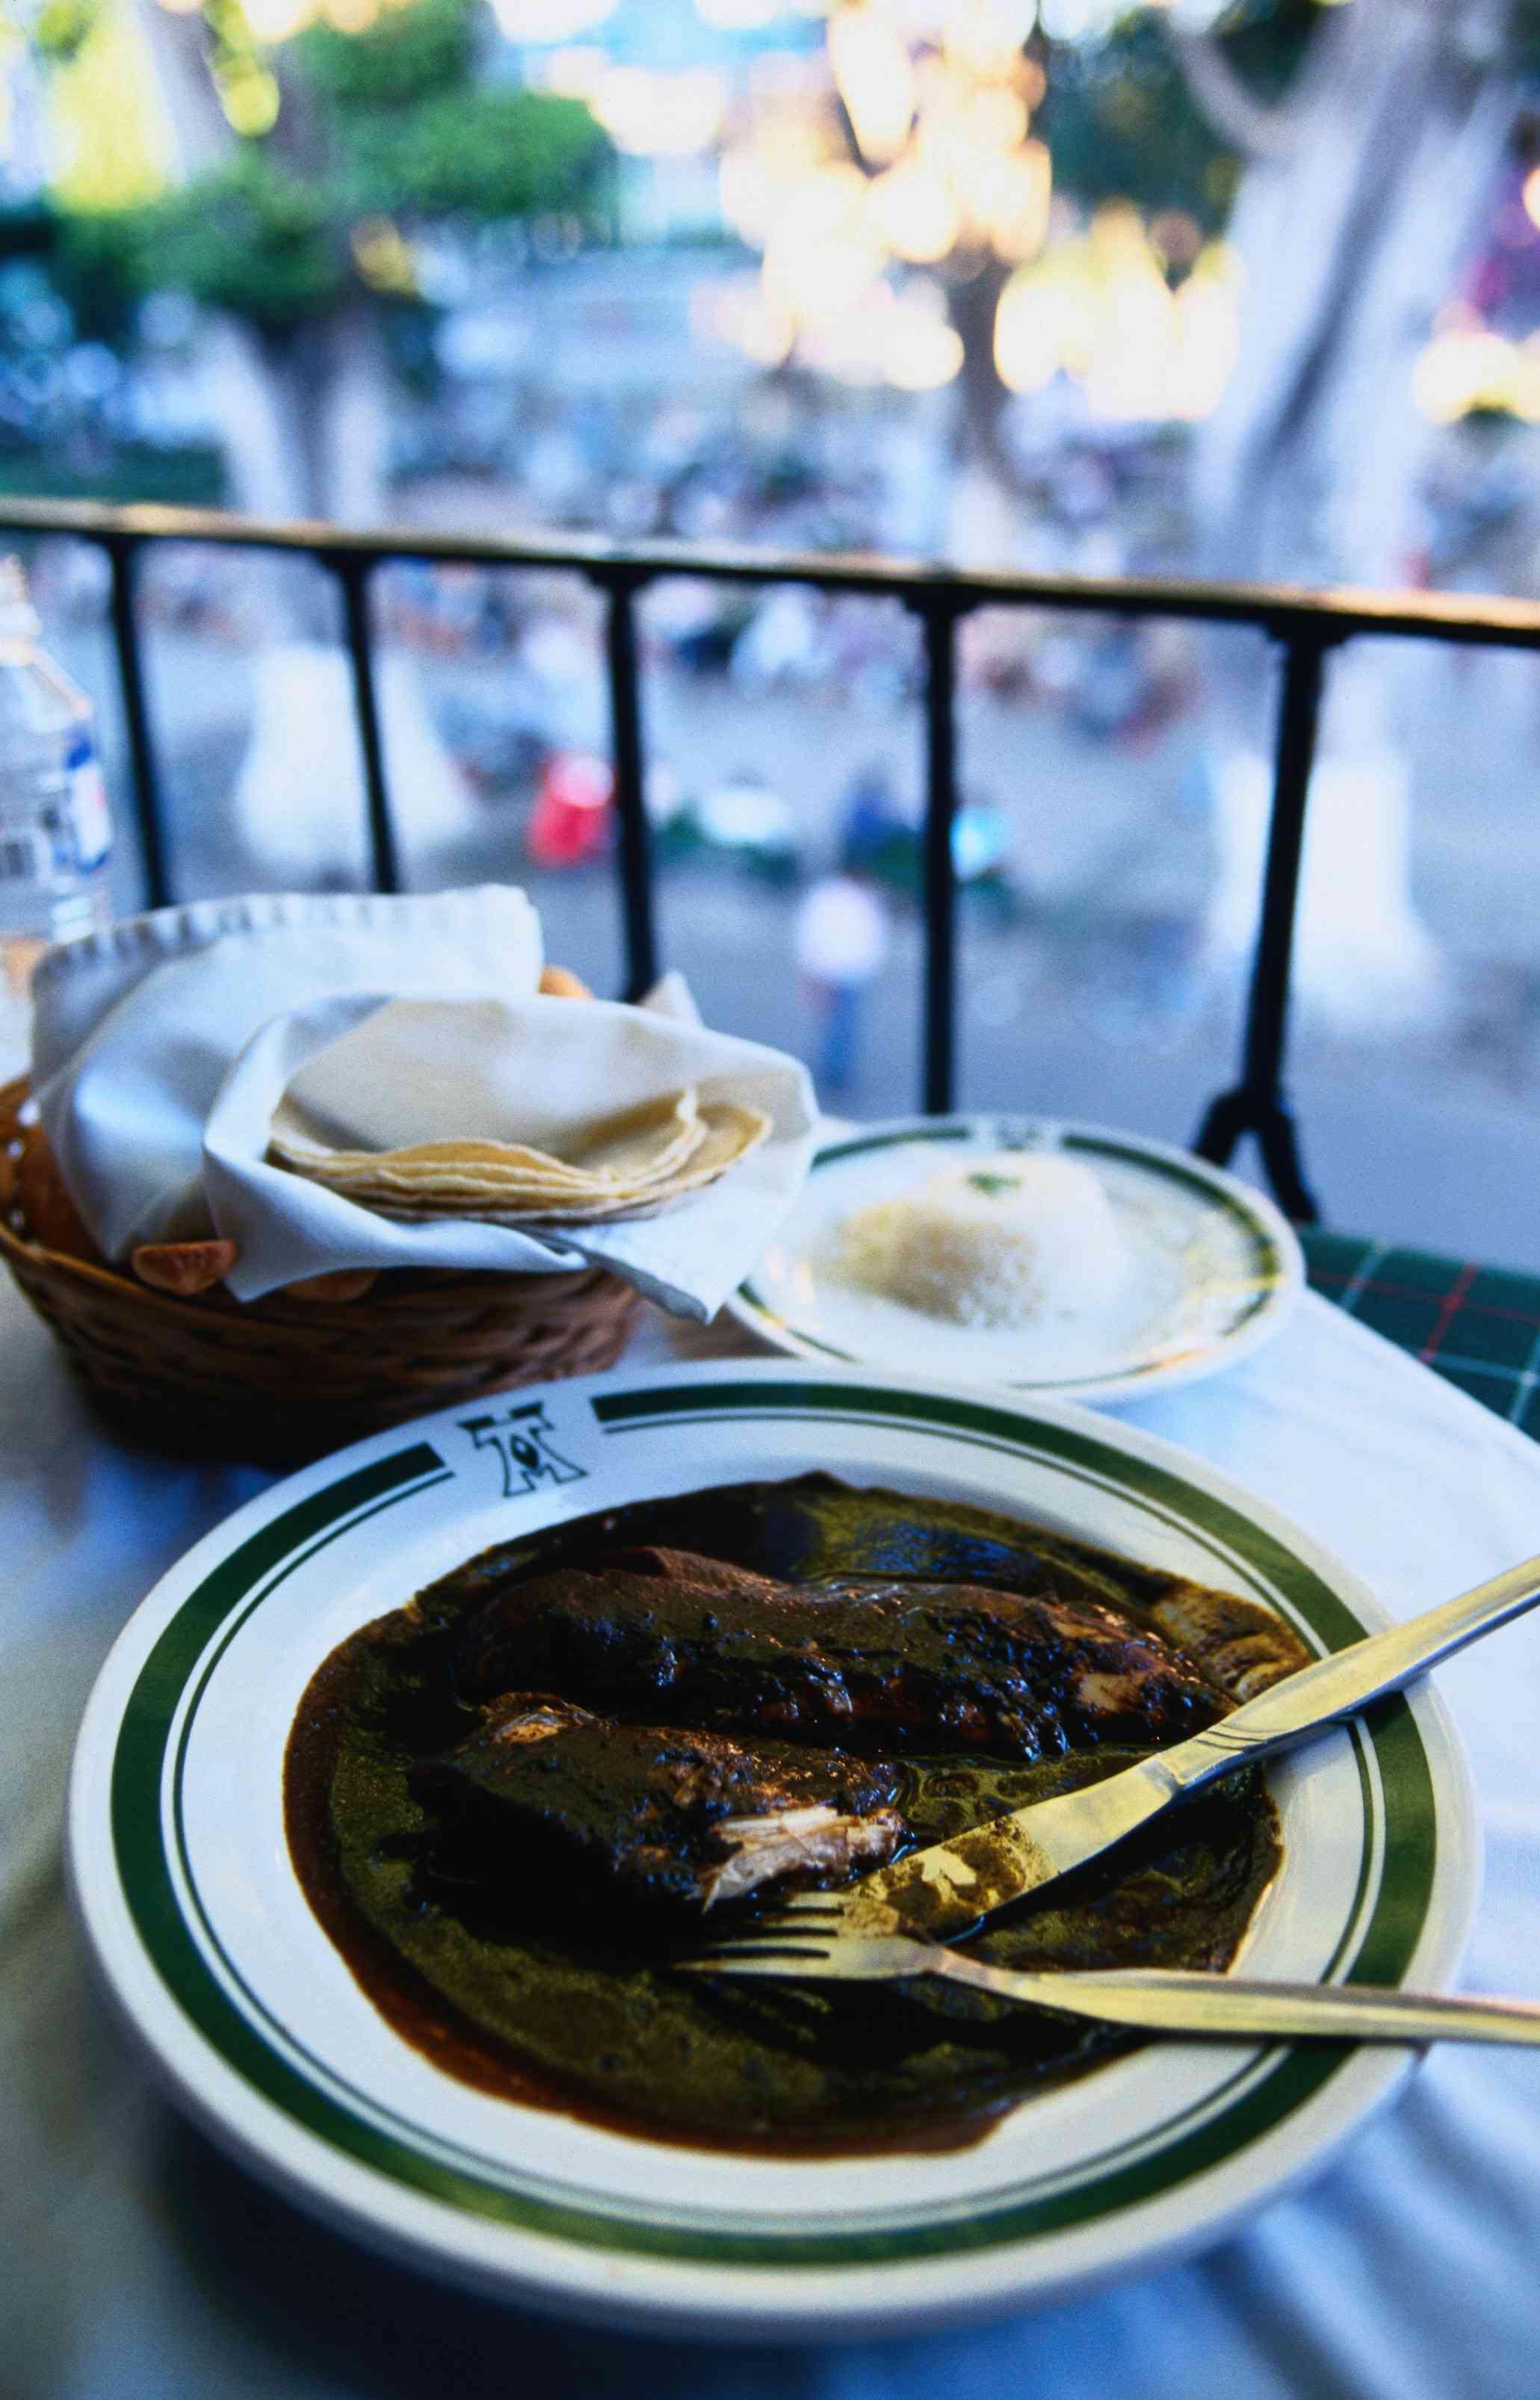 Pollo con Mole Negro served on a terrace overlooking Oaxaca's Zocalo